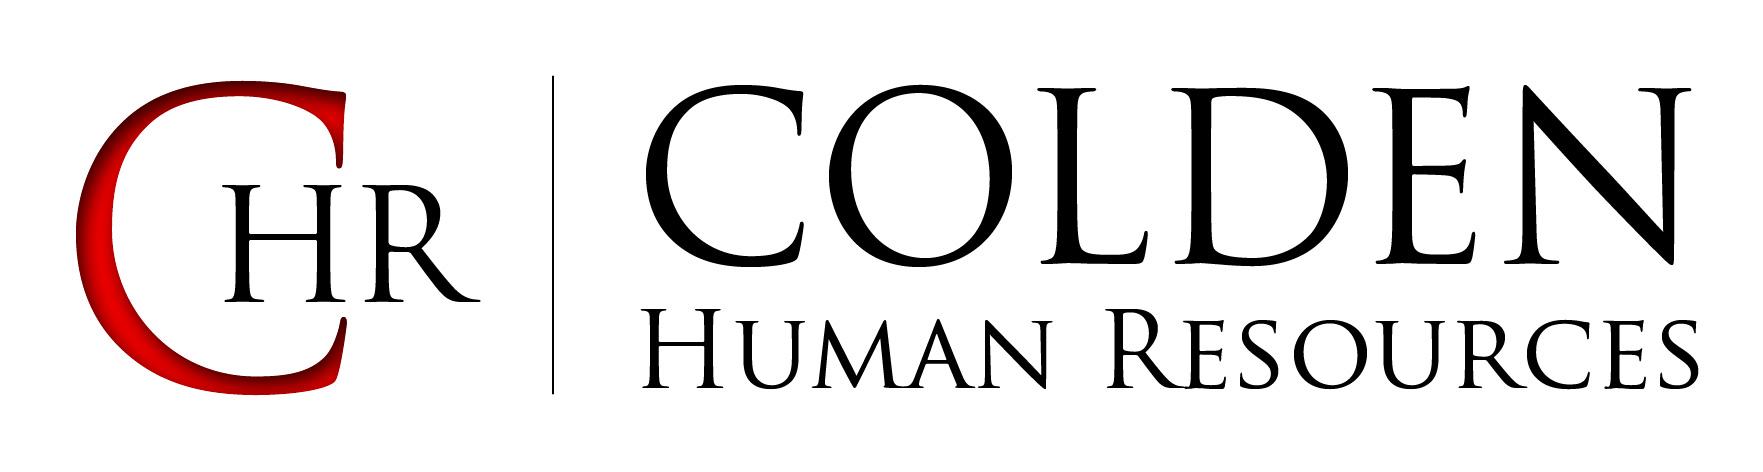 Colden Human Resources Ltd Logo